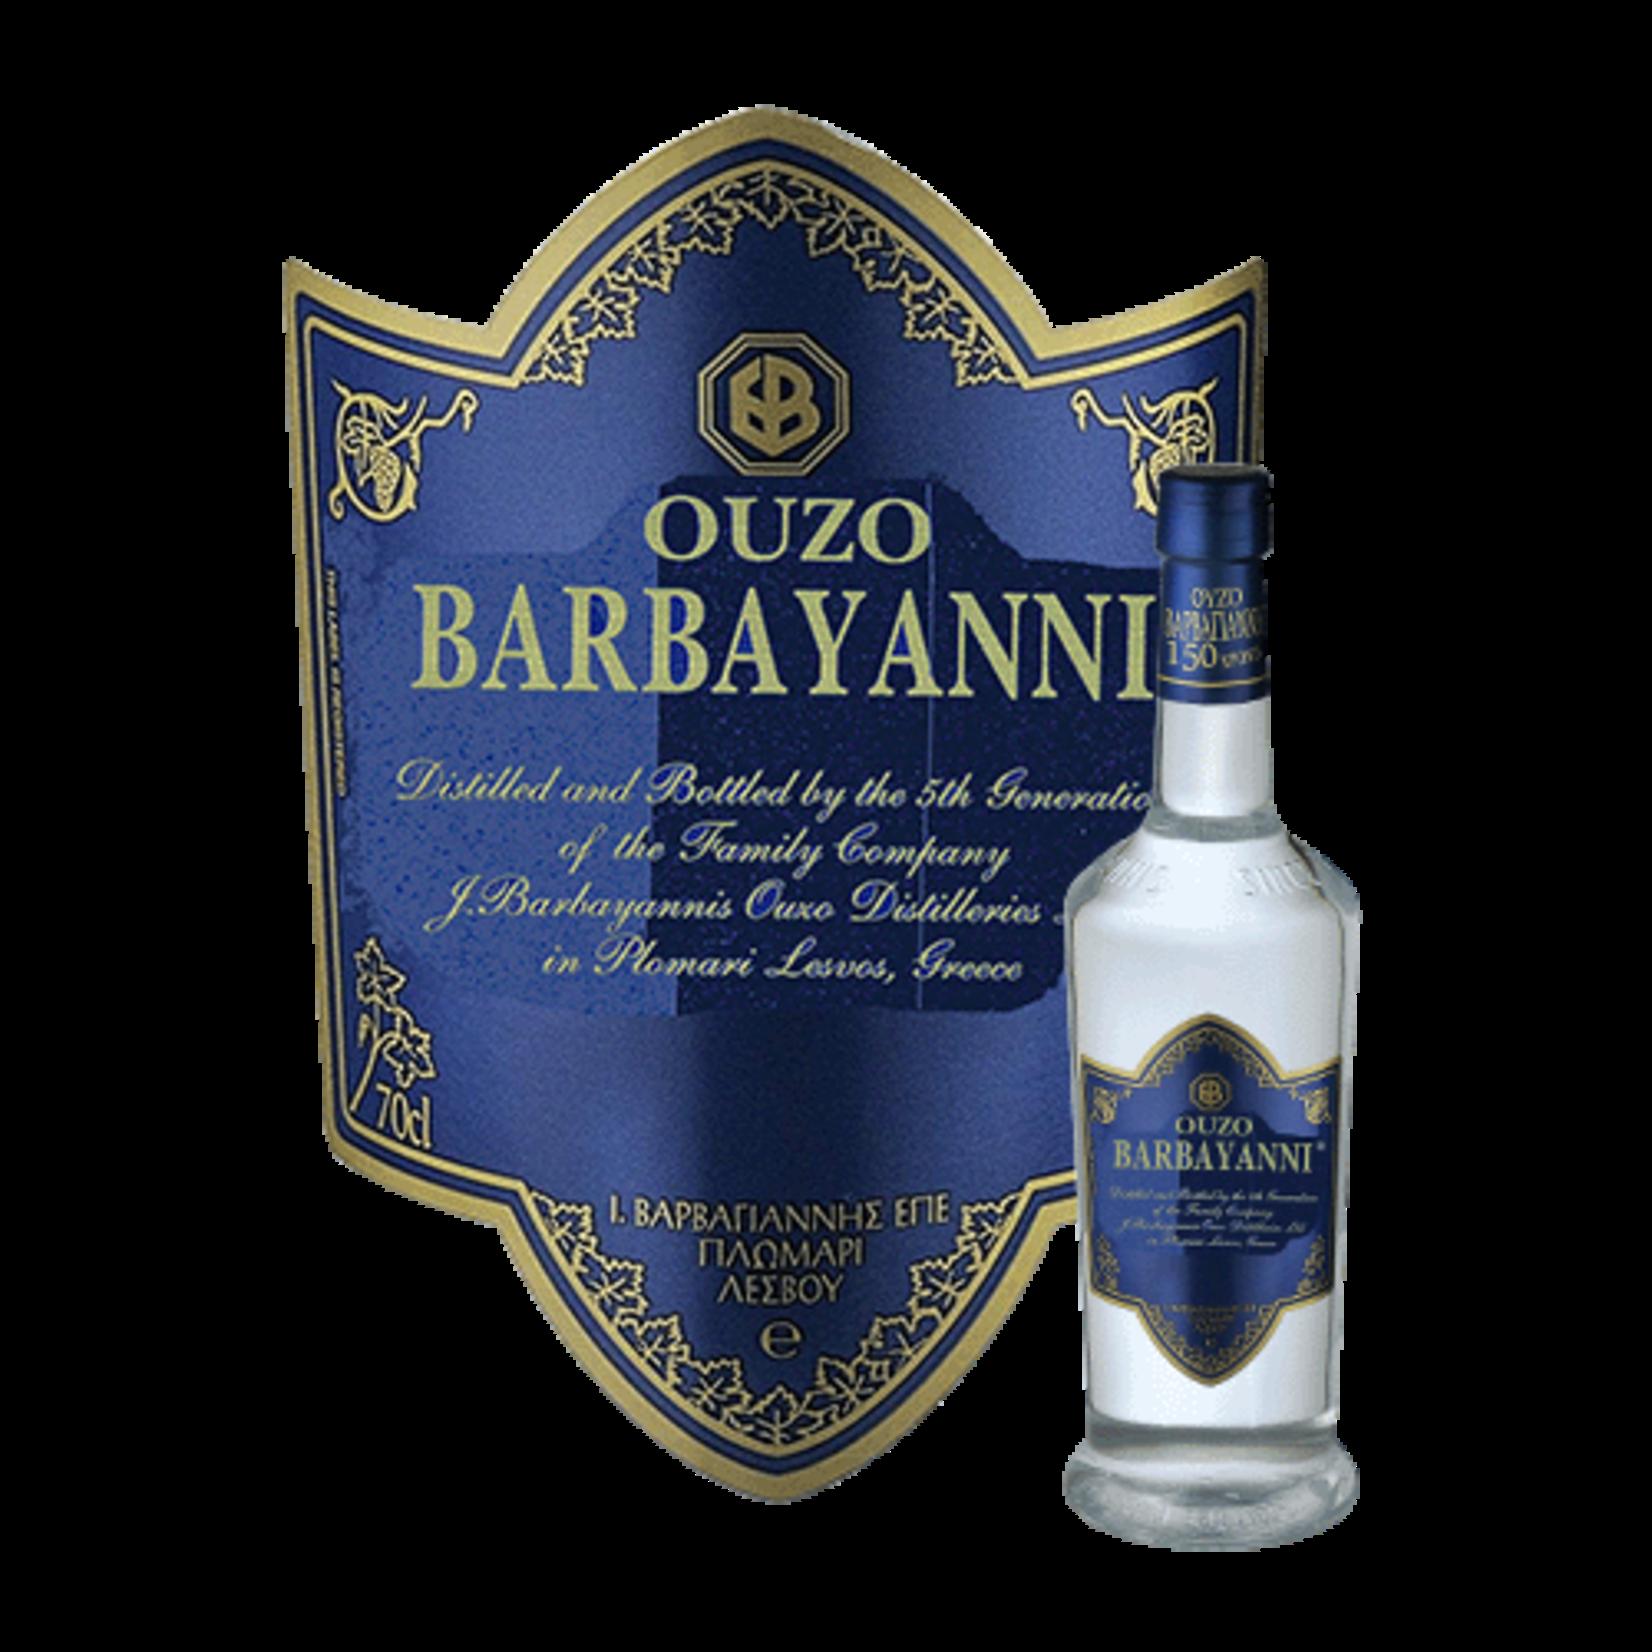 Spirits Barbayanni Ouzo Blue